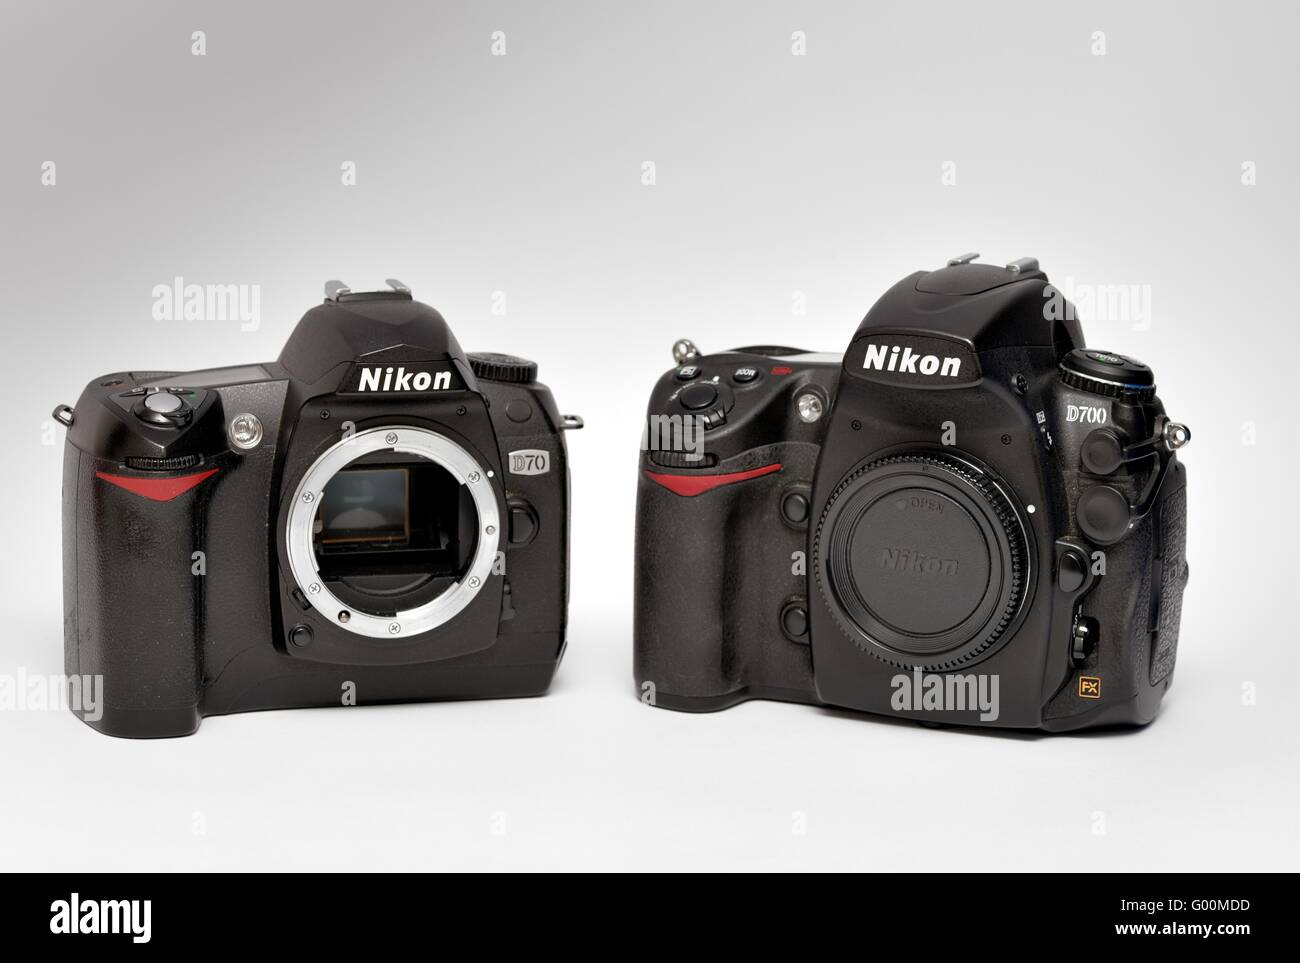 Nikon D70 and D700 digital SLR cameras - Stock Image